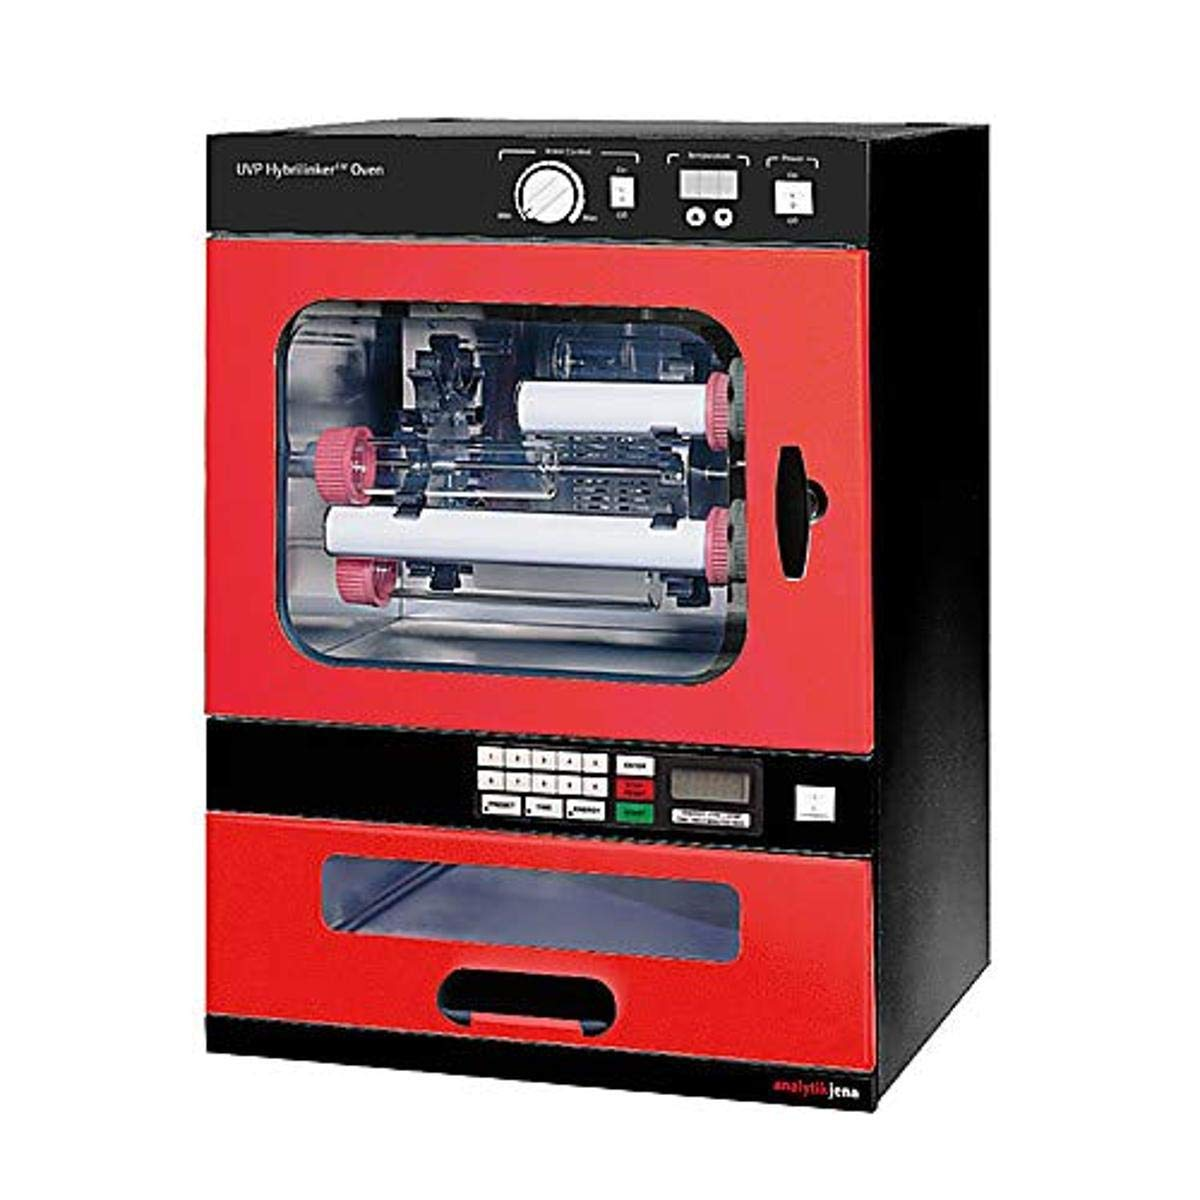 UVP 95-0031-02 Model HL-2000 Hybridization trend rank Max 68% OFF HybriLinker Oven 230